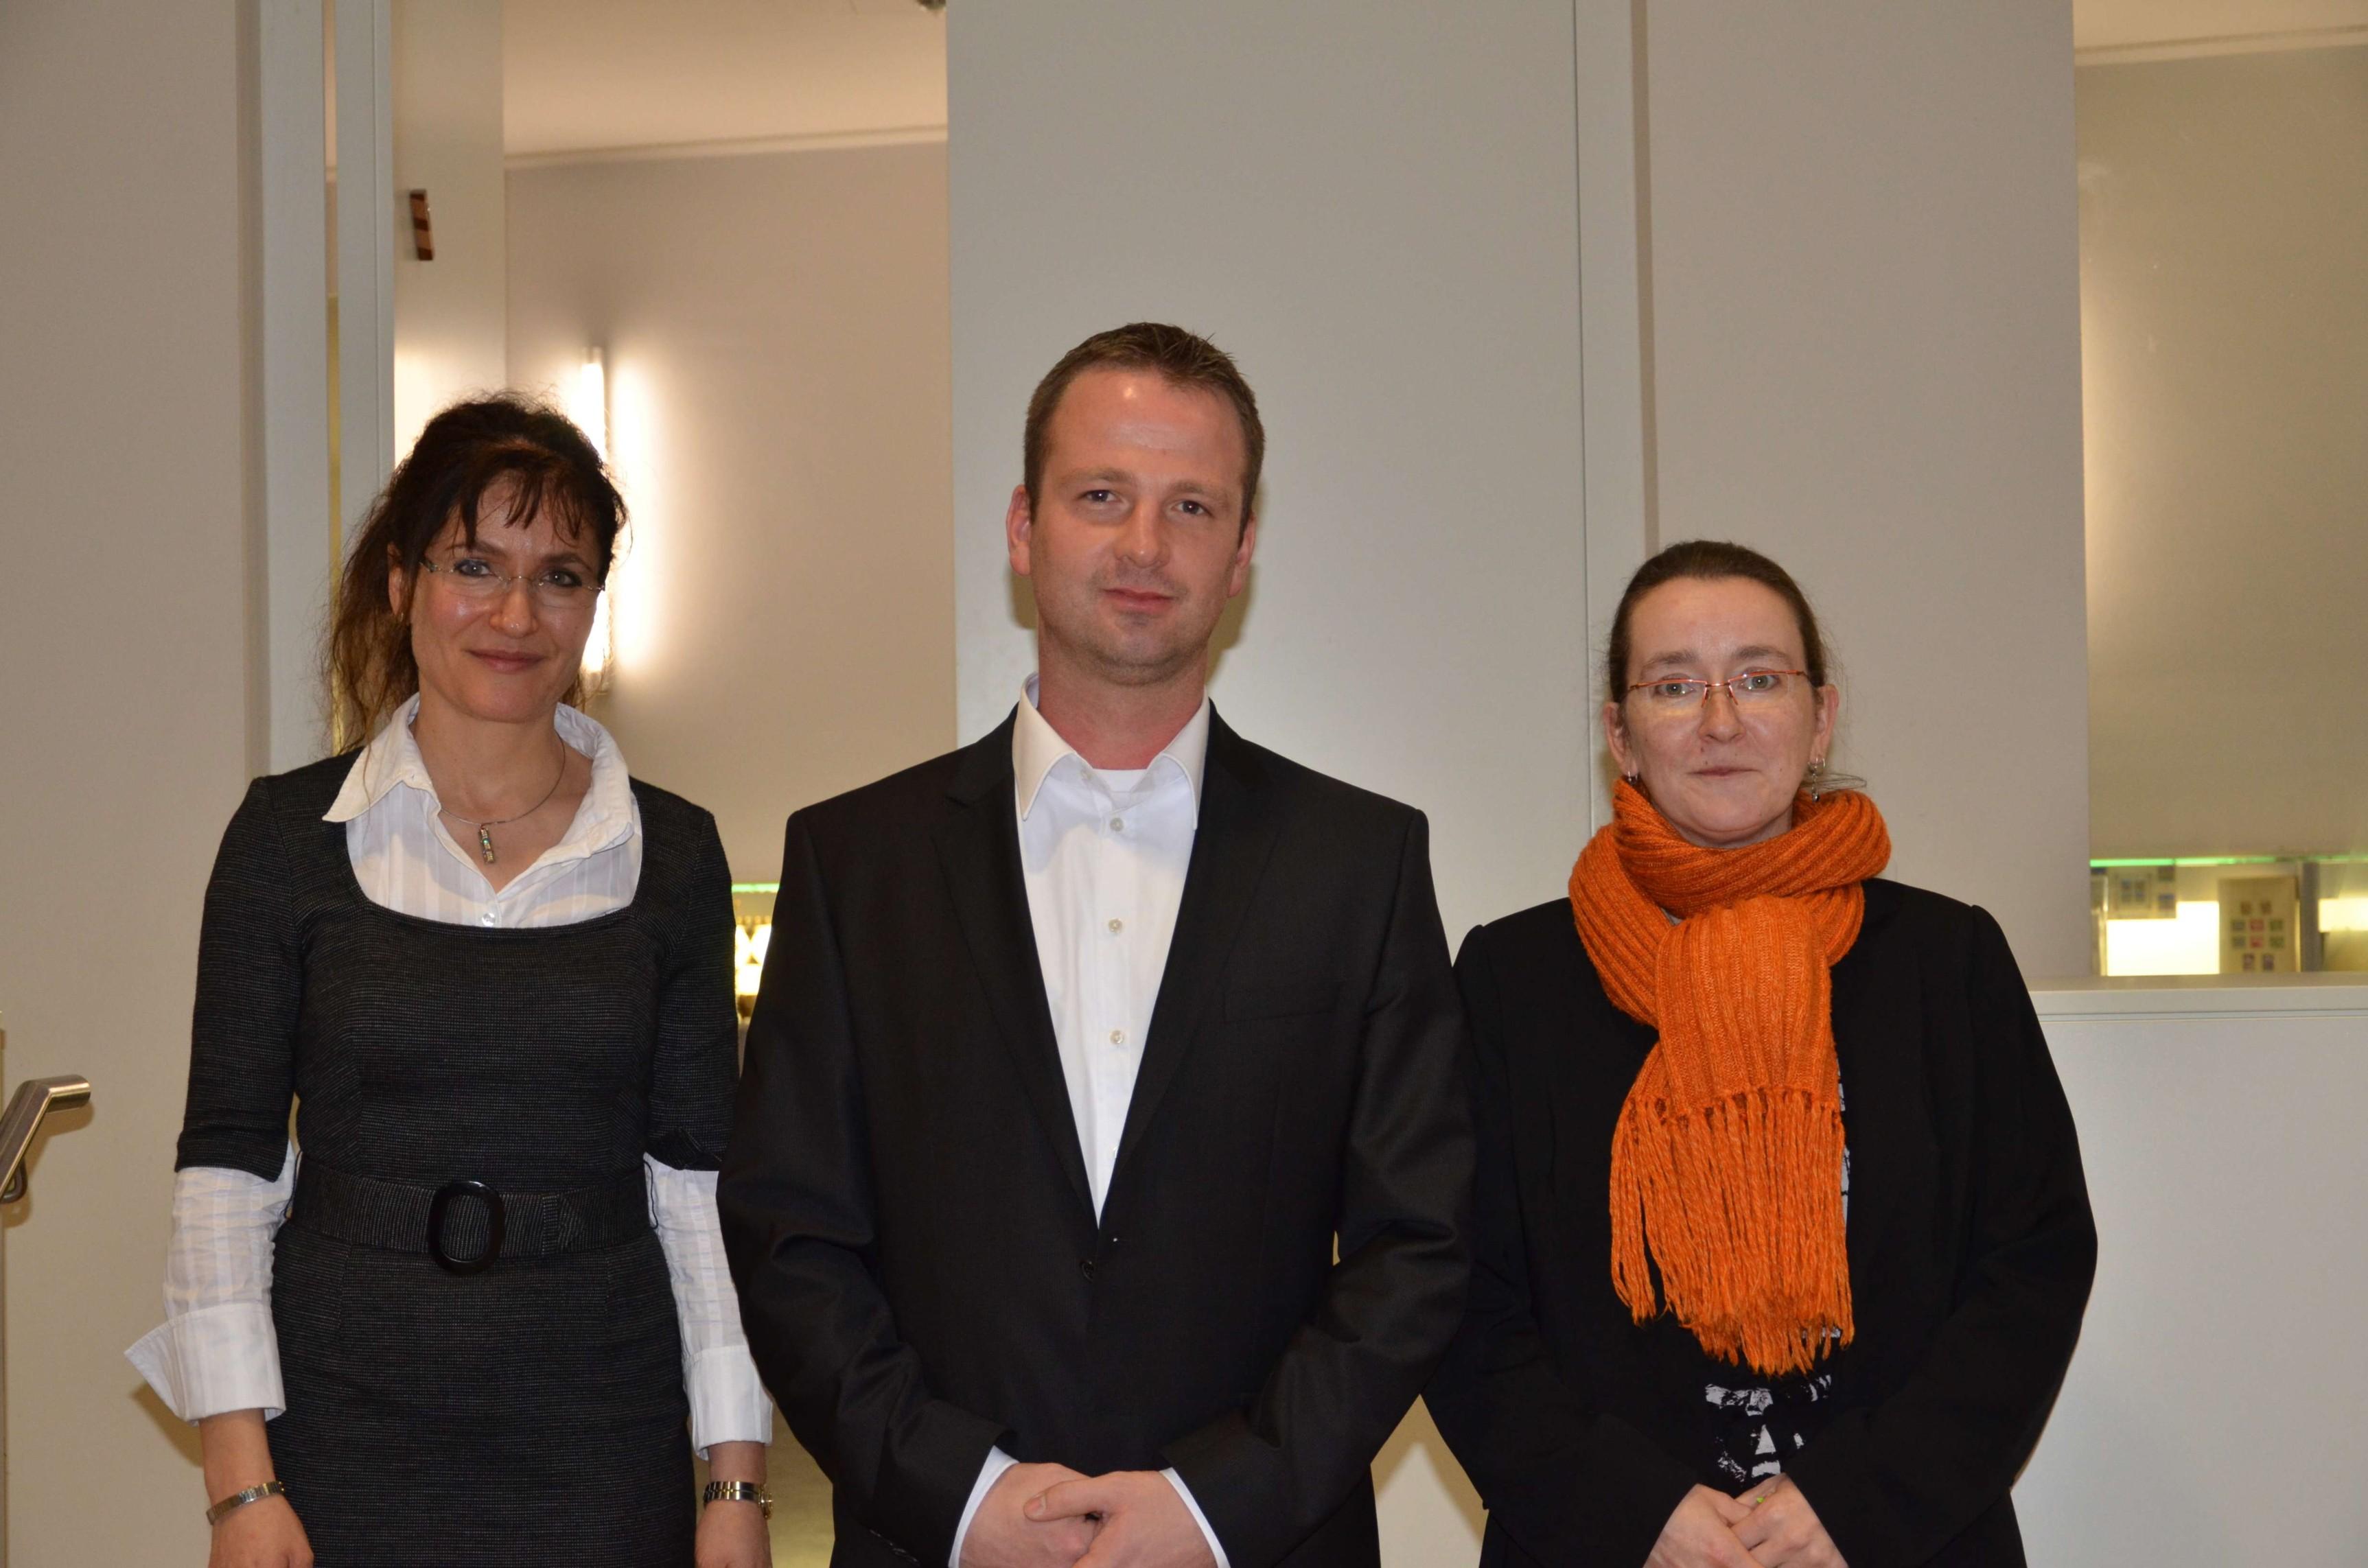 Judith Neuwald Tasbach (Jüdische Gemeinde), Patrick Arnold (Schalker Fanprojekt ) und Susanne Franke (Schalker Fan-Initiative e.V.), Foto: Jürgen Gabelmann